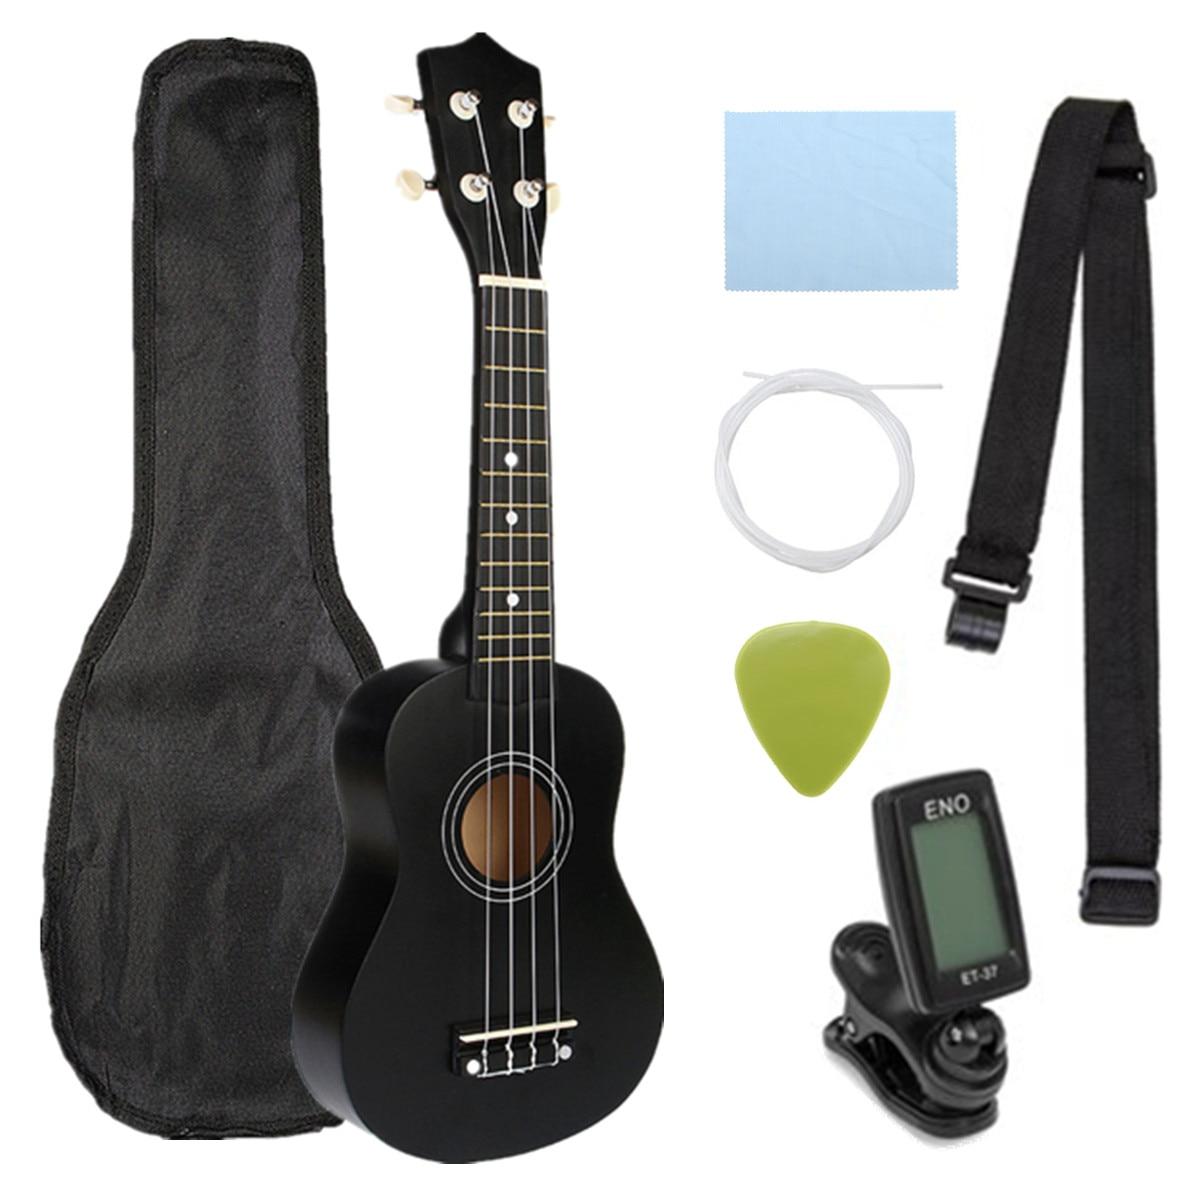 Cebra guitarra Combo 21 pulgadas 15 trastes ukelele Soprano Uke Hawaii bajo Musical guitarra instrumento Kits + sintonizador + cadena + correa + bolsa